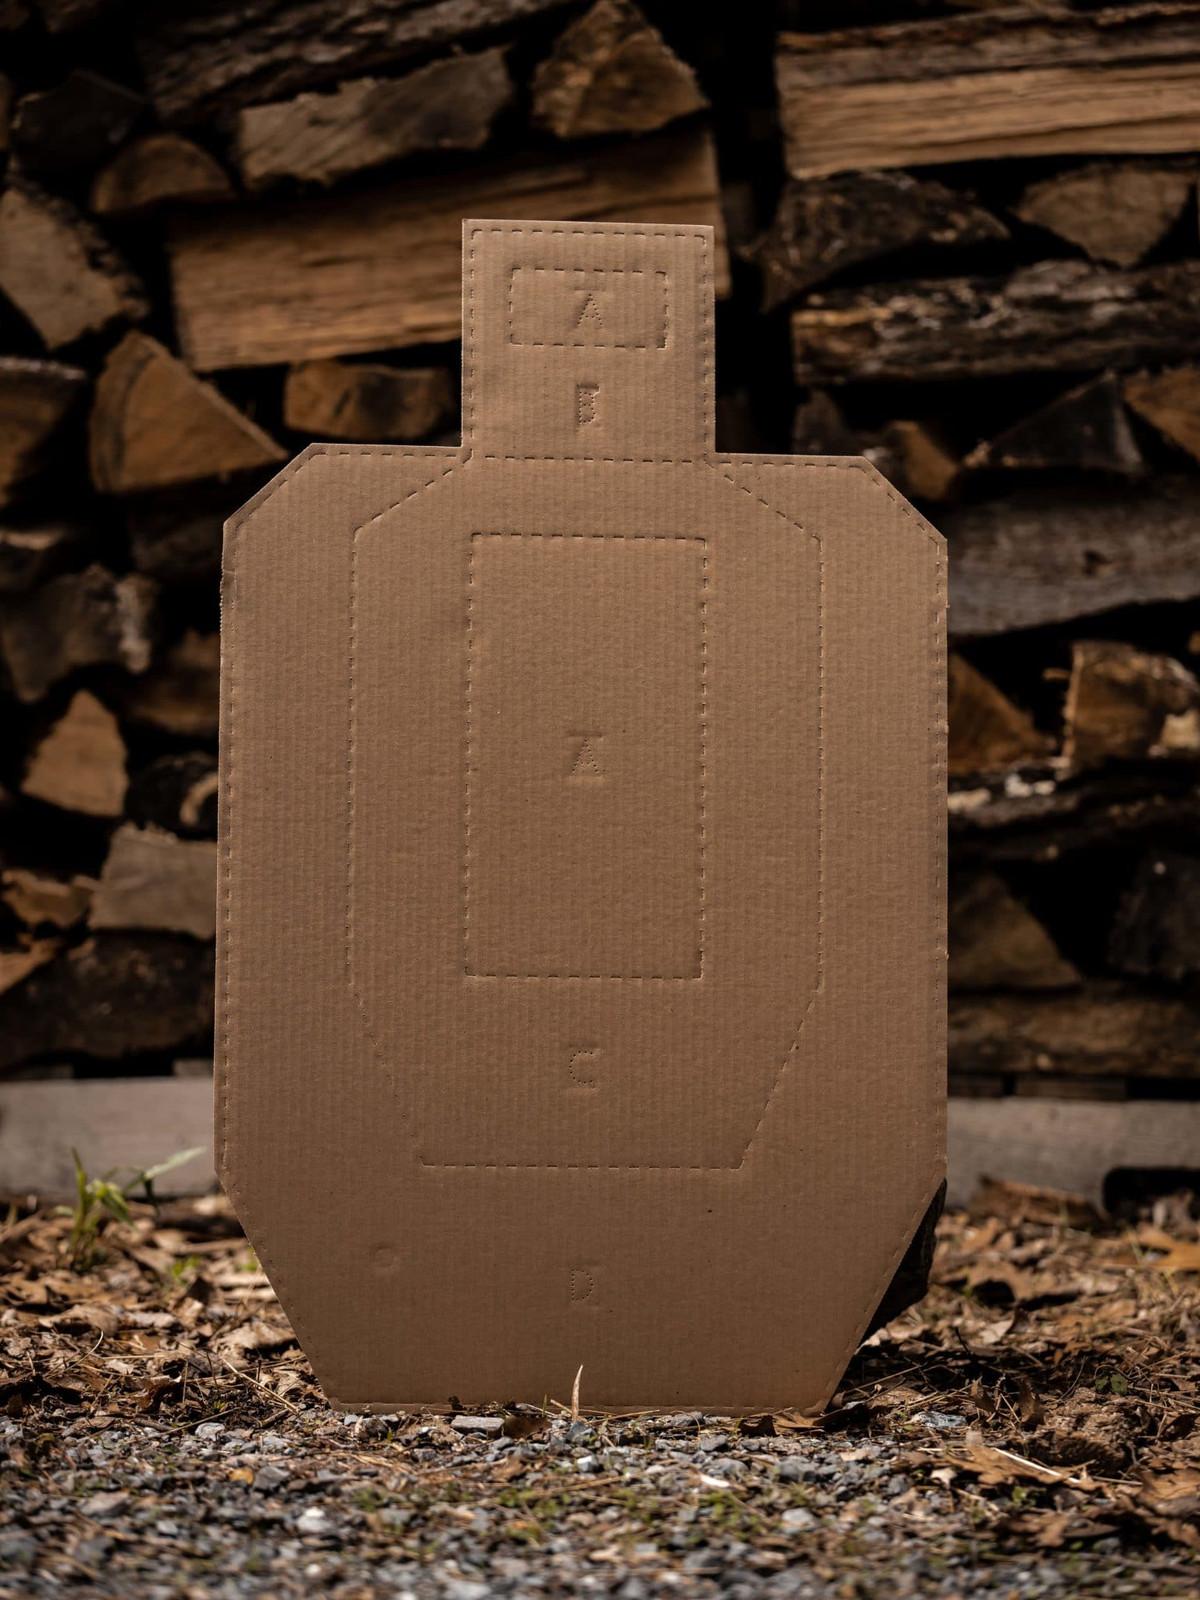 USPSA Cardboard Targets